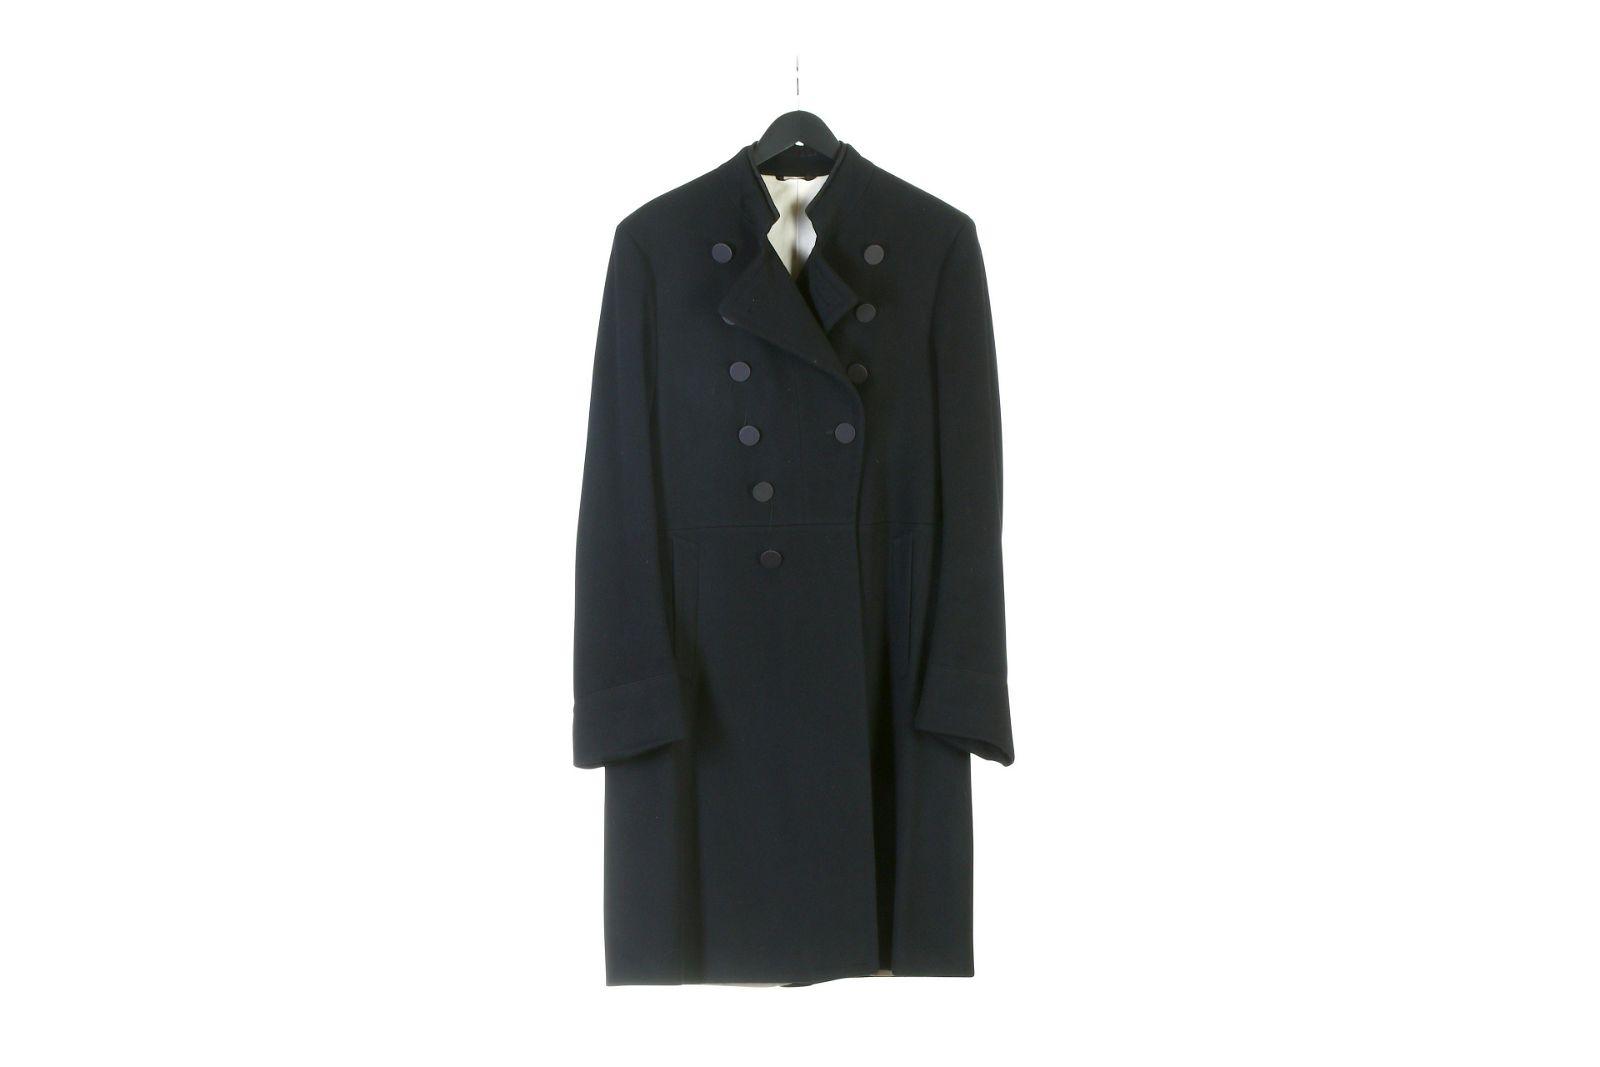 Gucci Men's Black Cashmere Coat